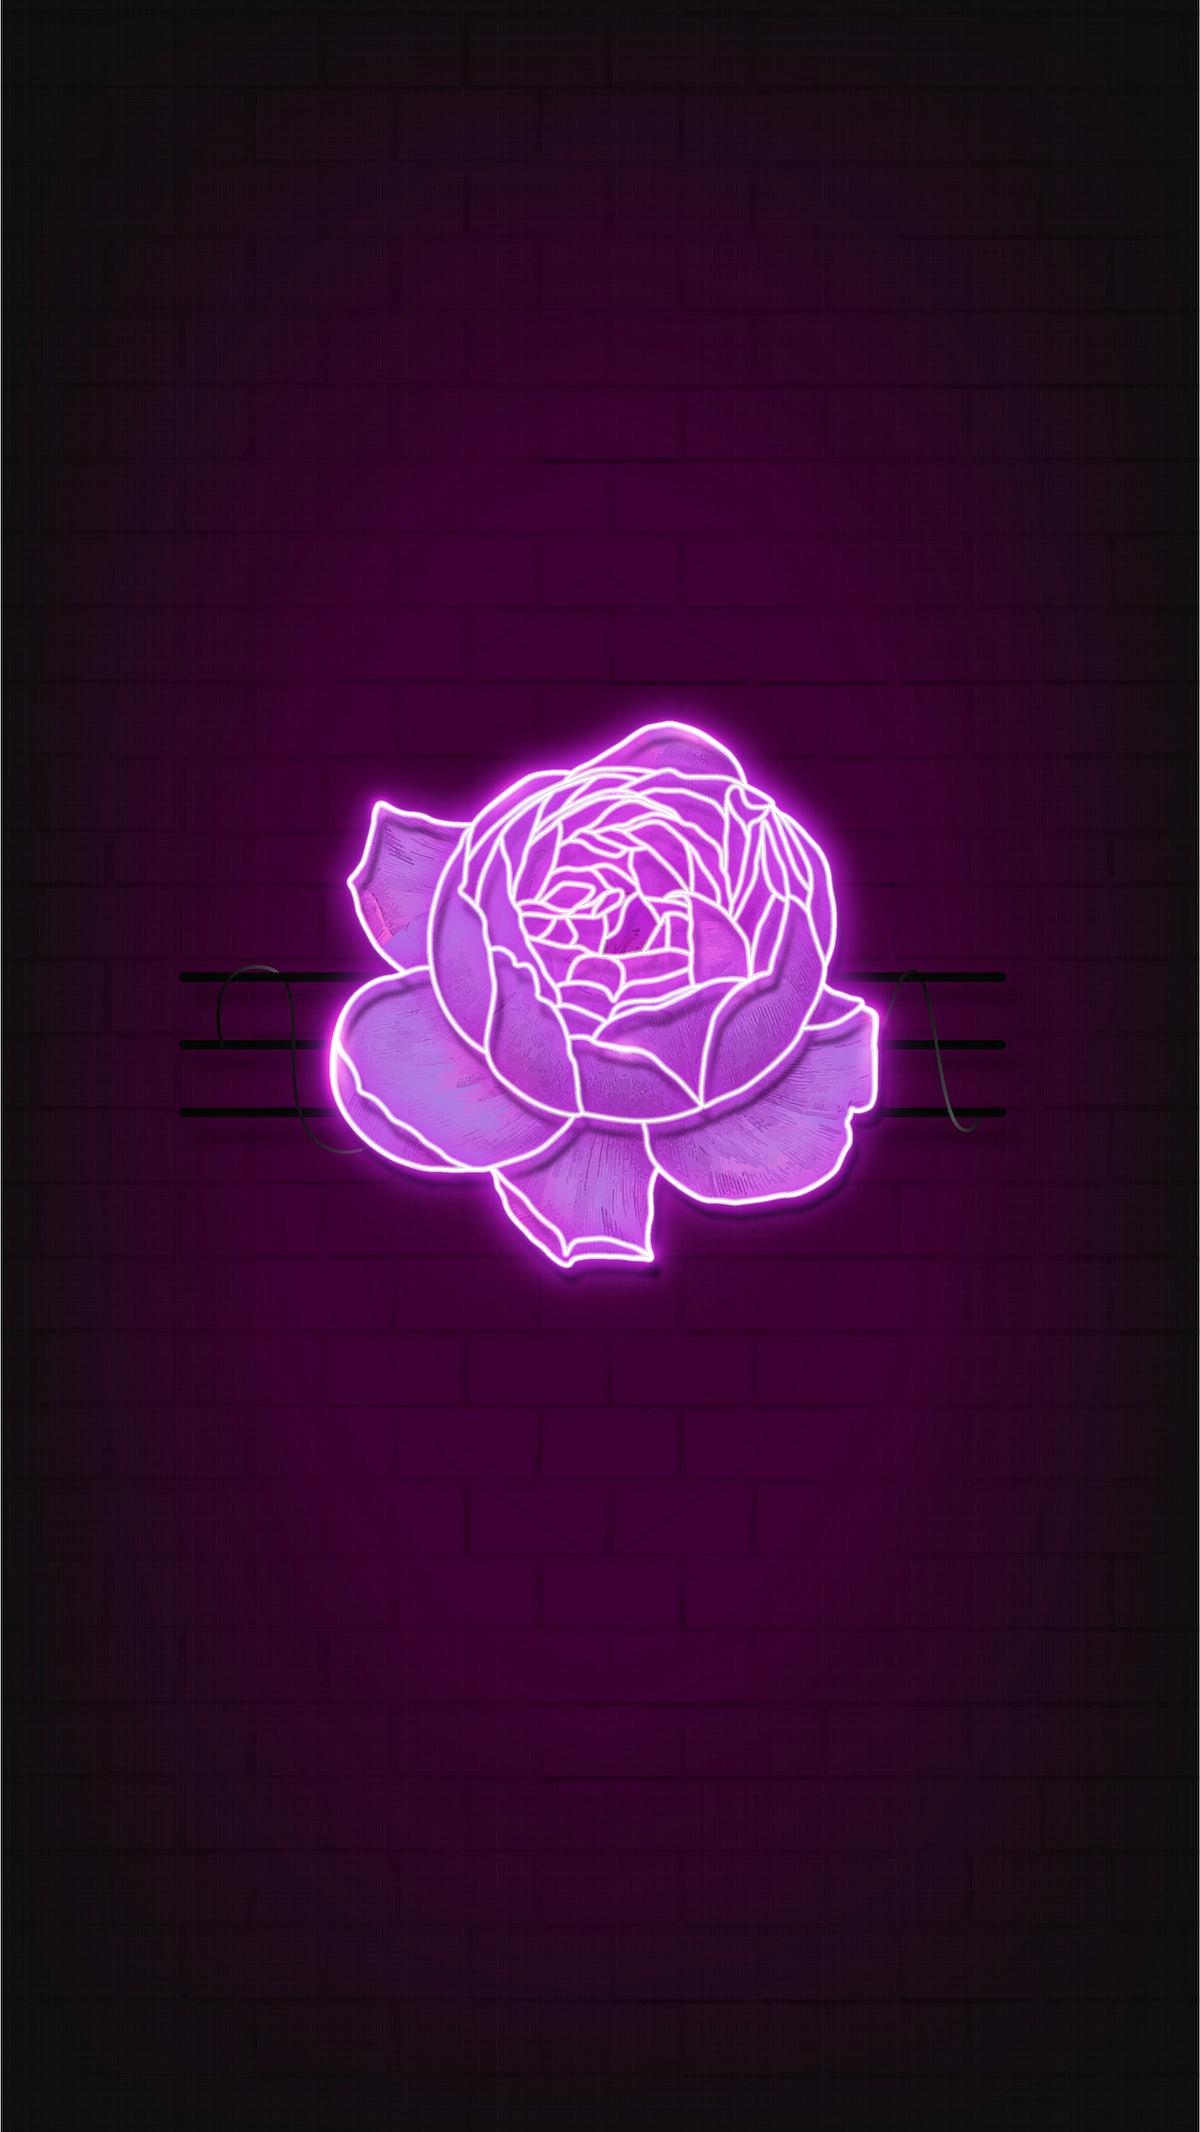 Purple Rose Mobile Wallpaper Royalty Free Vector 2102955